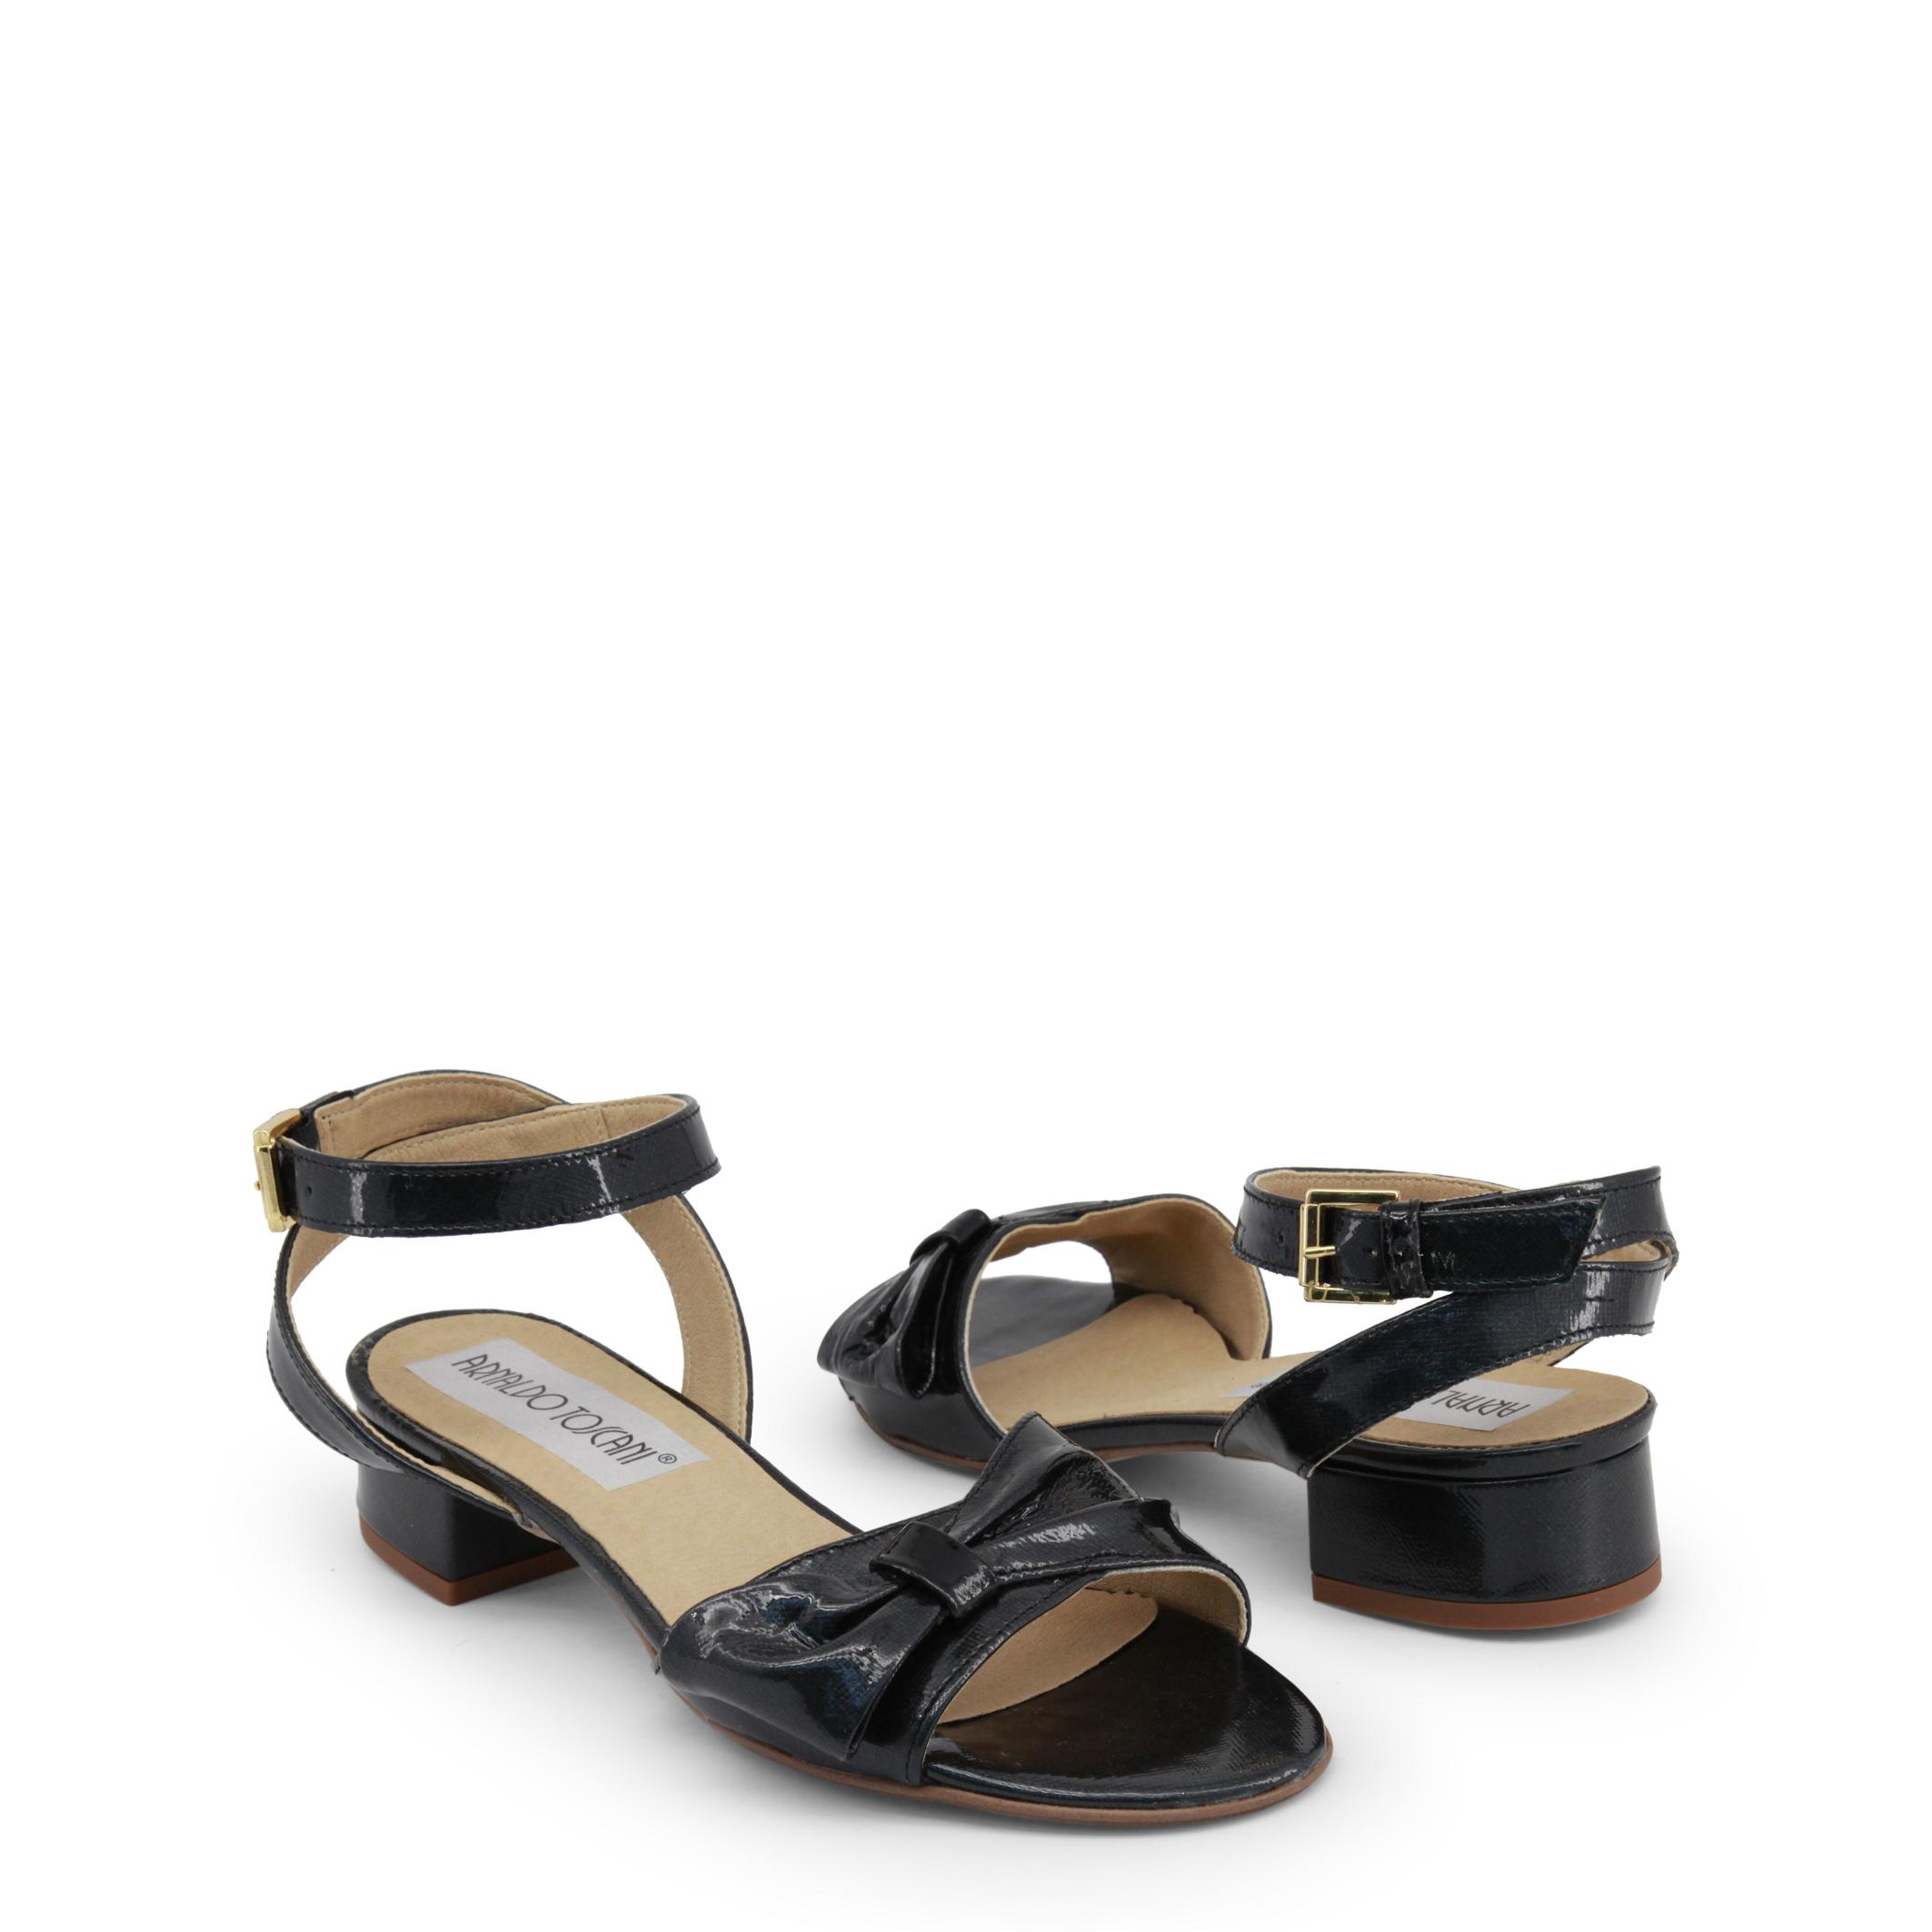 Arnaldo Toscani Schuhe 3280302, Damen Sandalette Rot/Schwarz/Gelb/Grün Keilabsat Keilabsat Rot/Schwarz/Gelb/Grün a31430